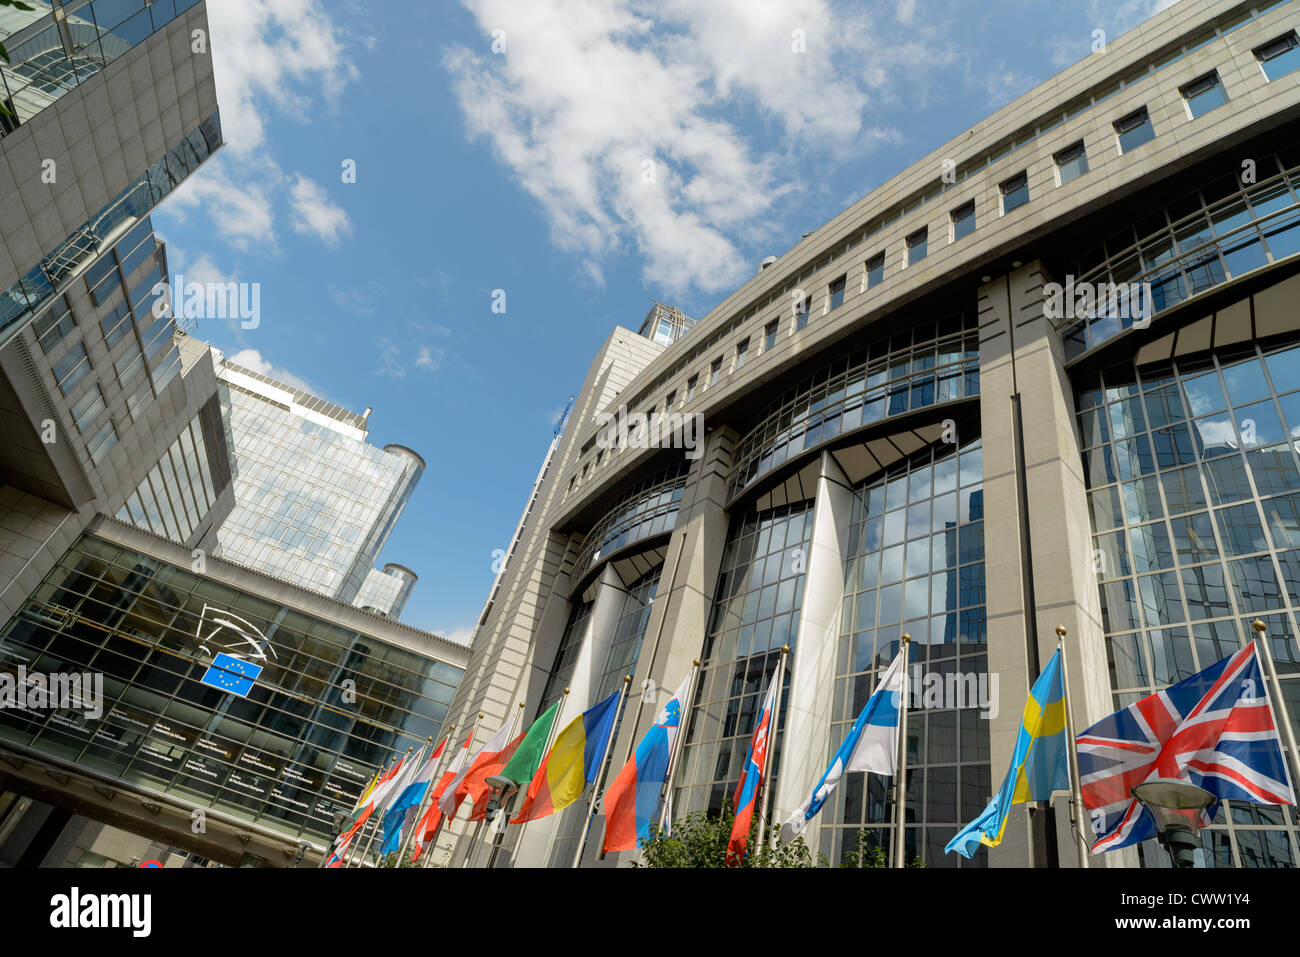 European Parliament Building,Brussels,Europe Stock Photo